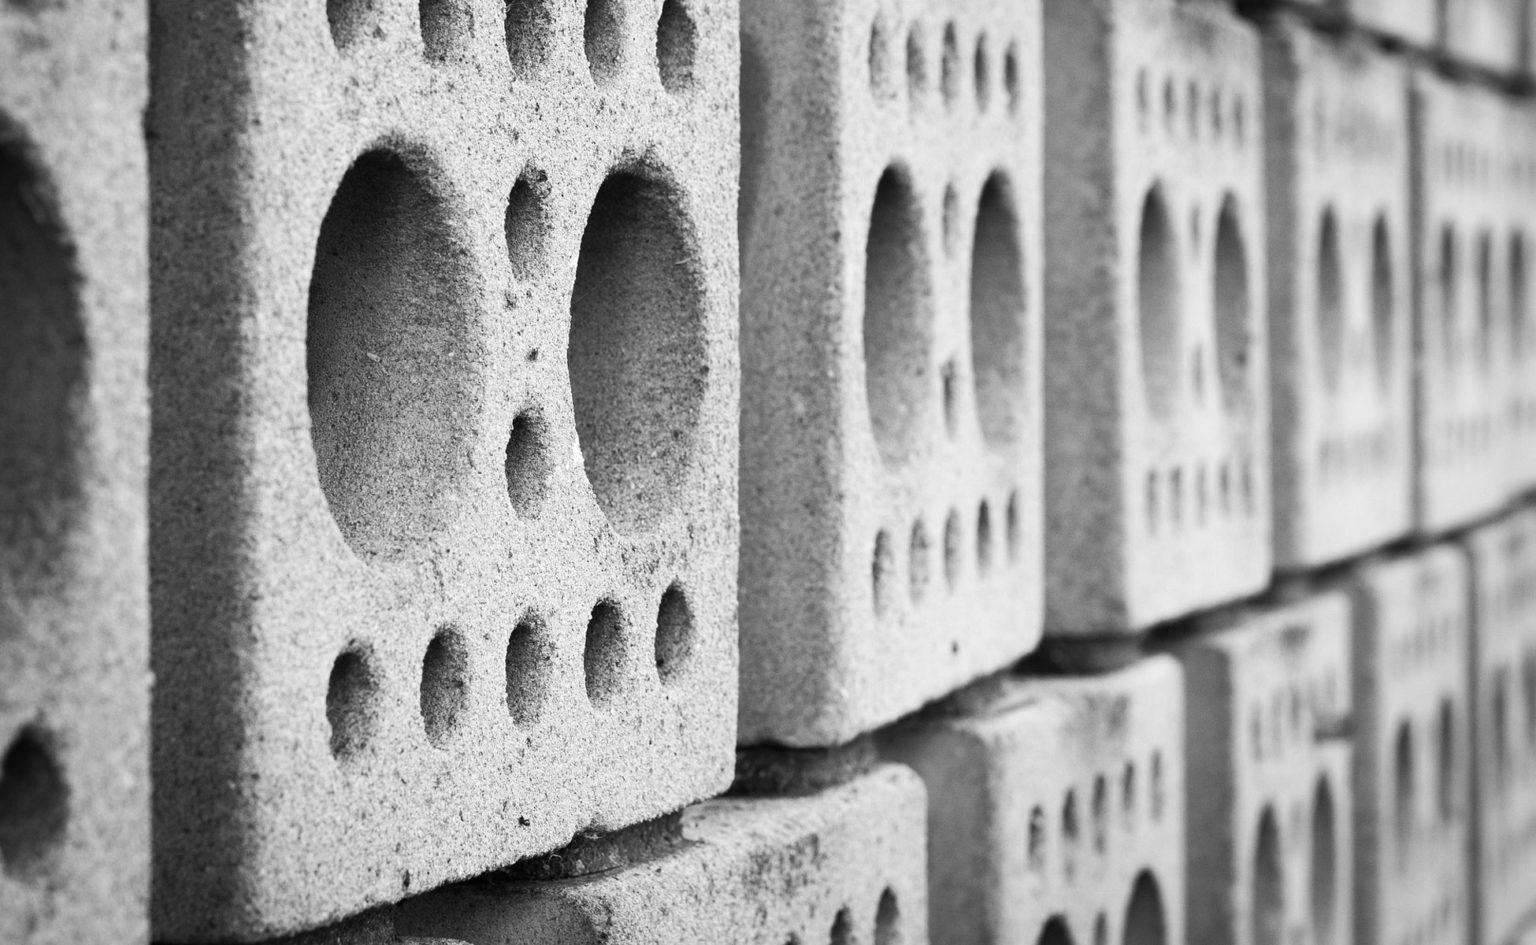 Baugroup Baumaterial Betonfertigteile